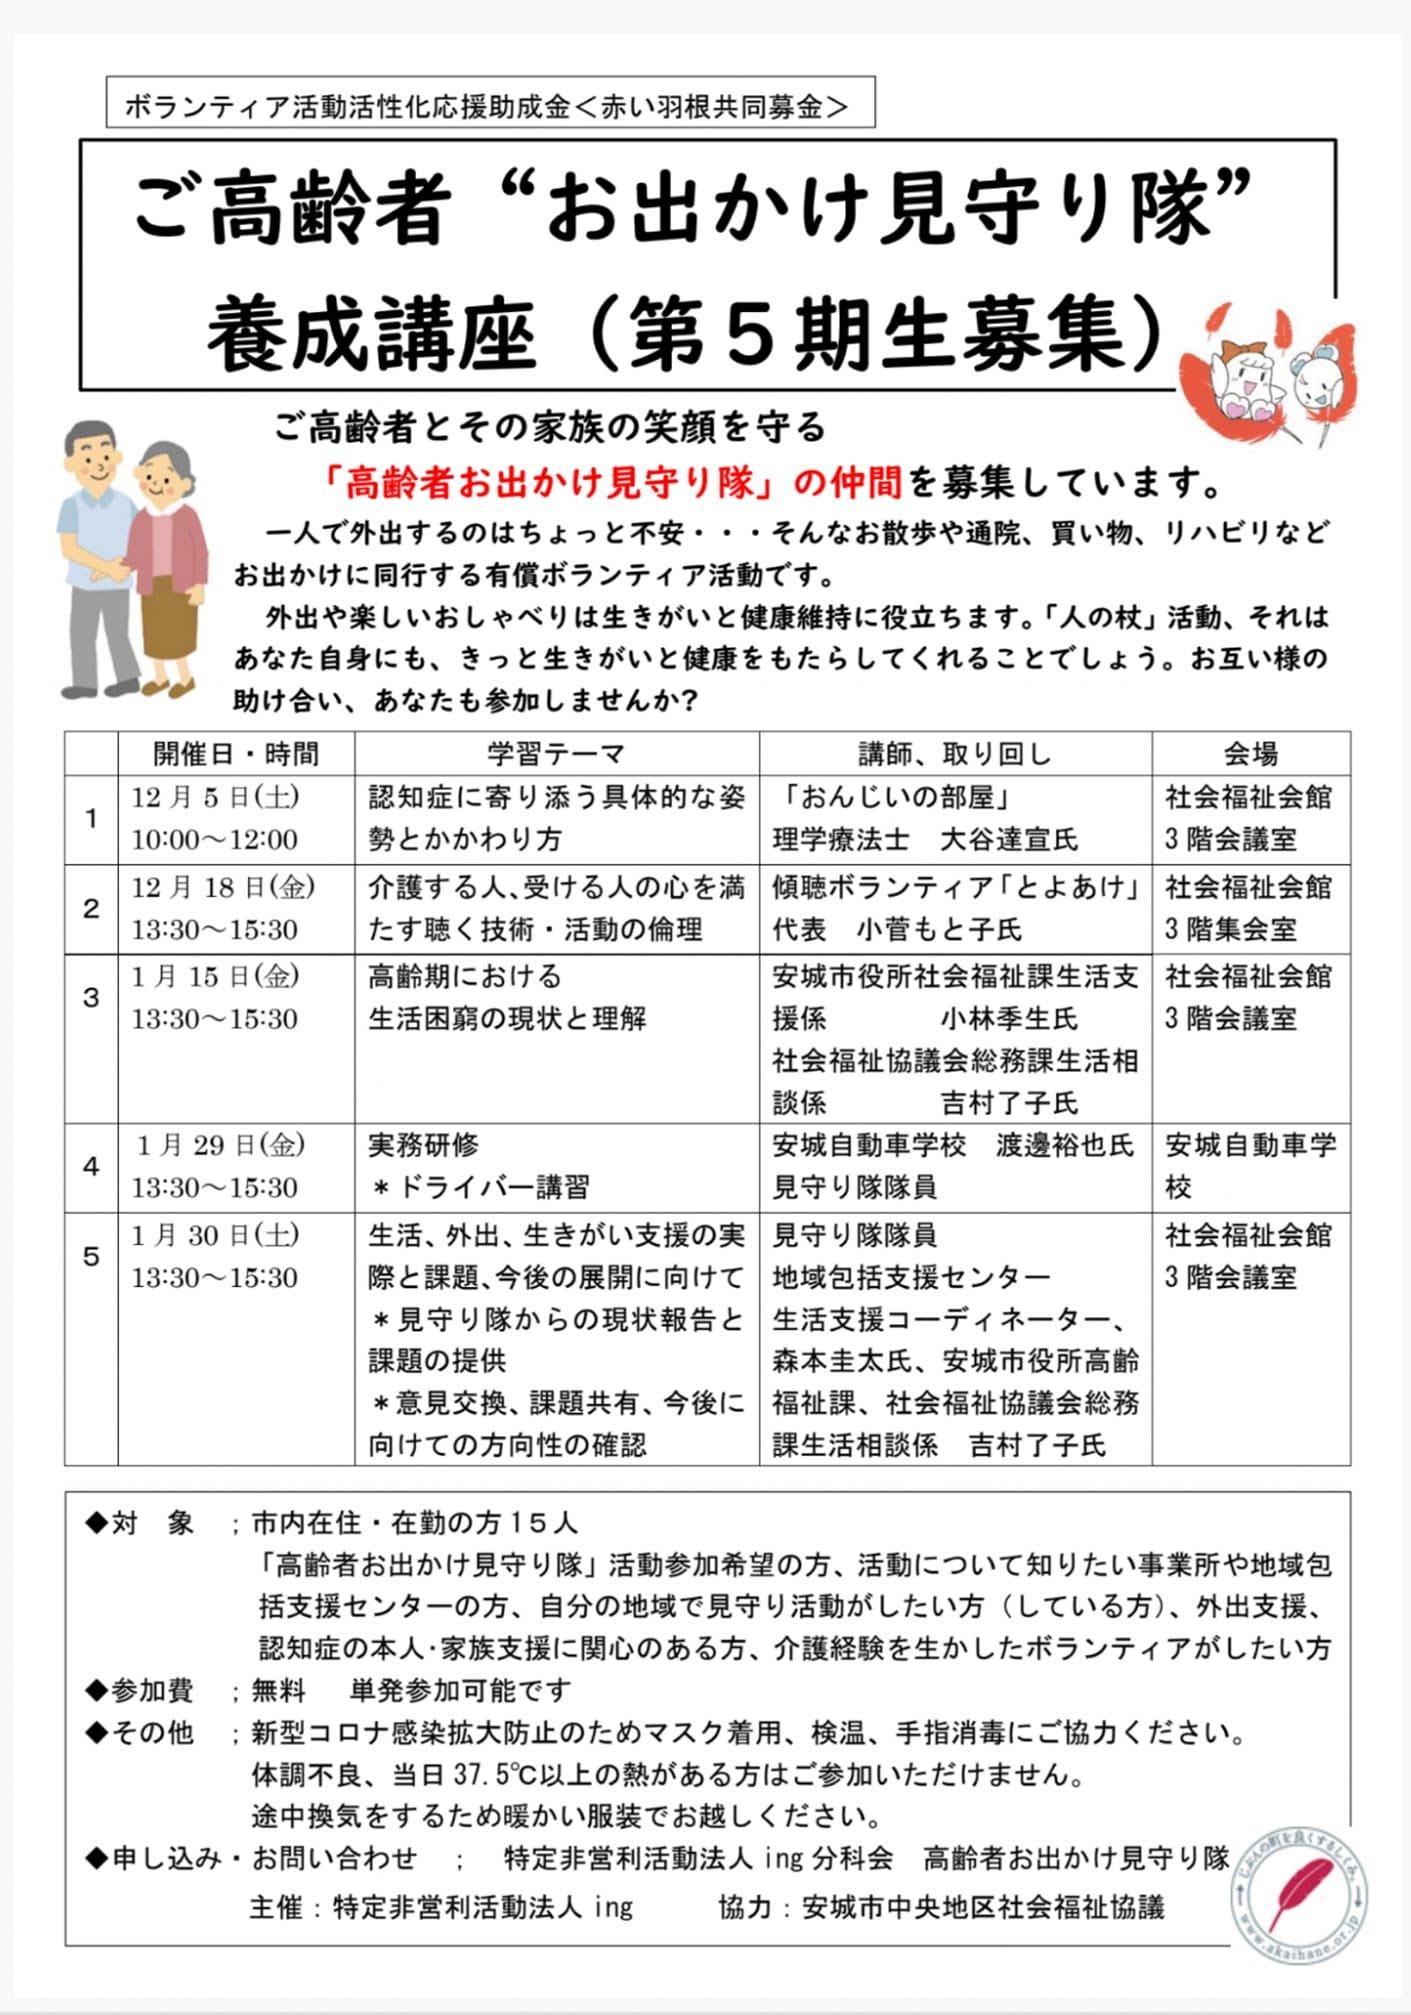 http://npoing.web.fc2.com/2020mimamoritaiyouseikouza.pdf